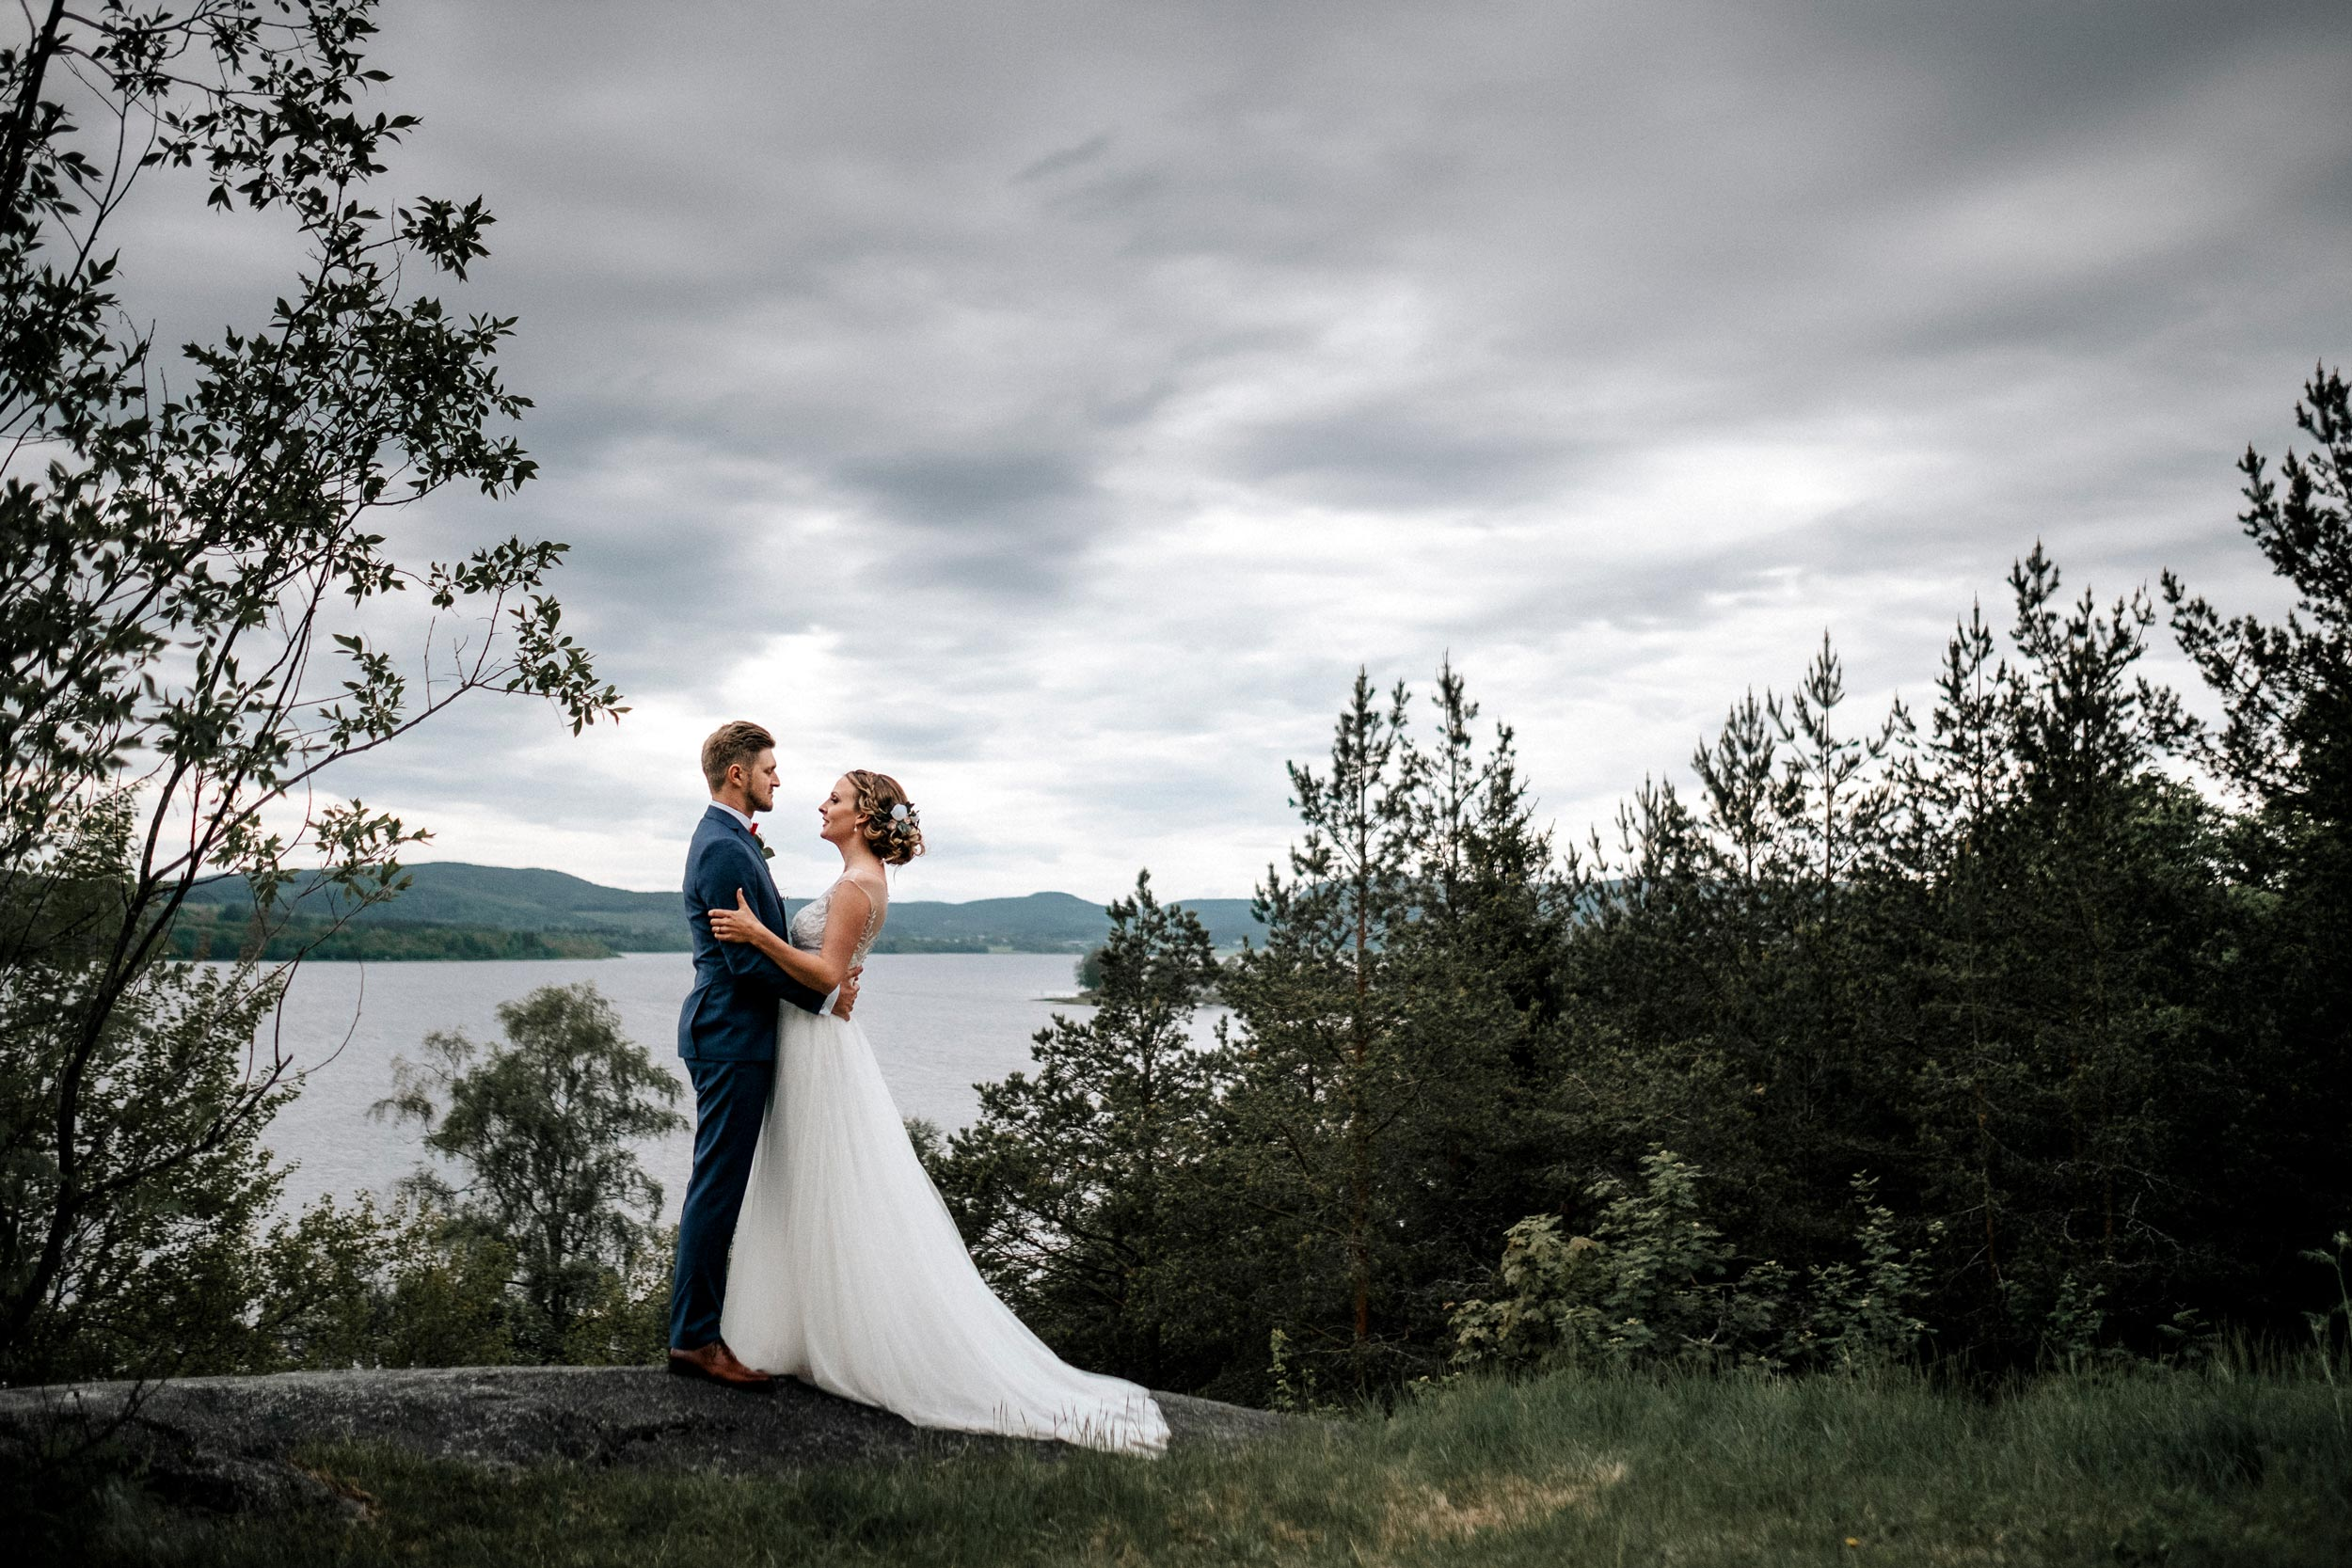 authentic, brudpar, bröllop, bröllopsfotograf, bröllopsfotografering, bröllopsfotografi, calm, connection, couples, dan, destination photographer, fotadig.nu, fotograf, fotografering, full day coverage, glad, glädje, glädjefyllt, heldag, jonas burman, joyful, känslor, lugn, mikaela, mikaela and dan, mikaela och dan, moment design, neijdebro, photography, själevad, själevad kyrka, sommar, sverige, sweden, tavelsjö, umeå, västerbotten, wedding, wedding photographer, wedding photography, ärligt, örnsköldsvik, övik